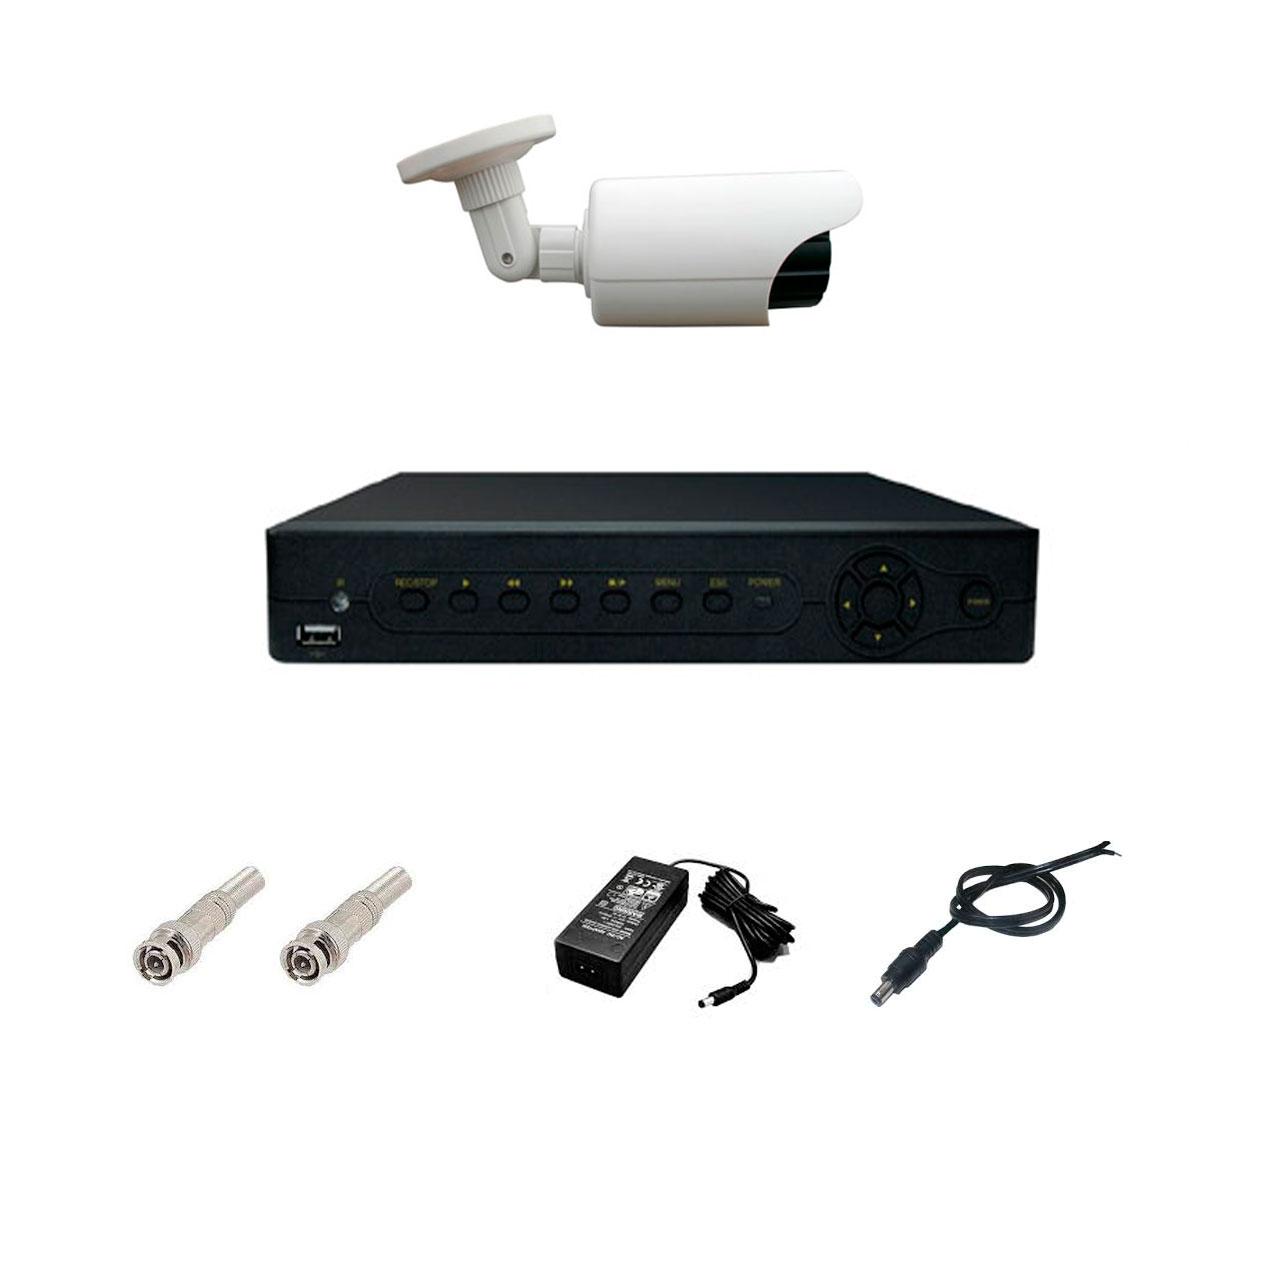 پک سیستم امنیتی دوربین مداربسته نظارتی SX4001A